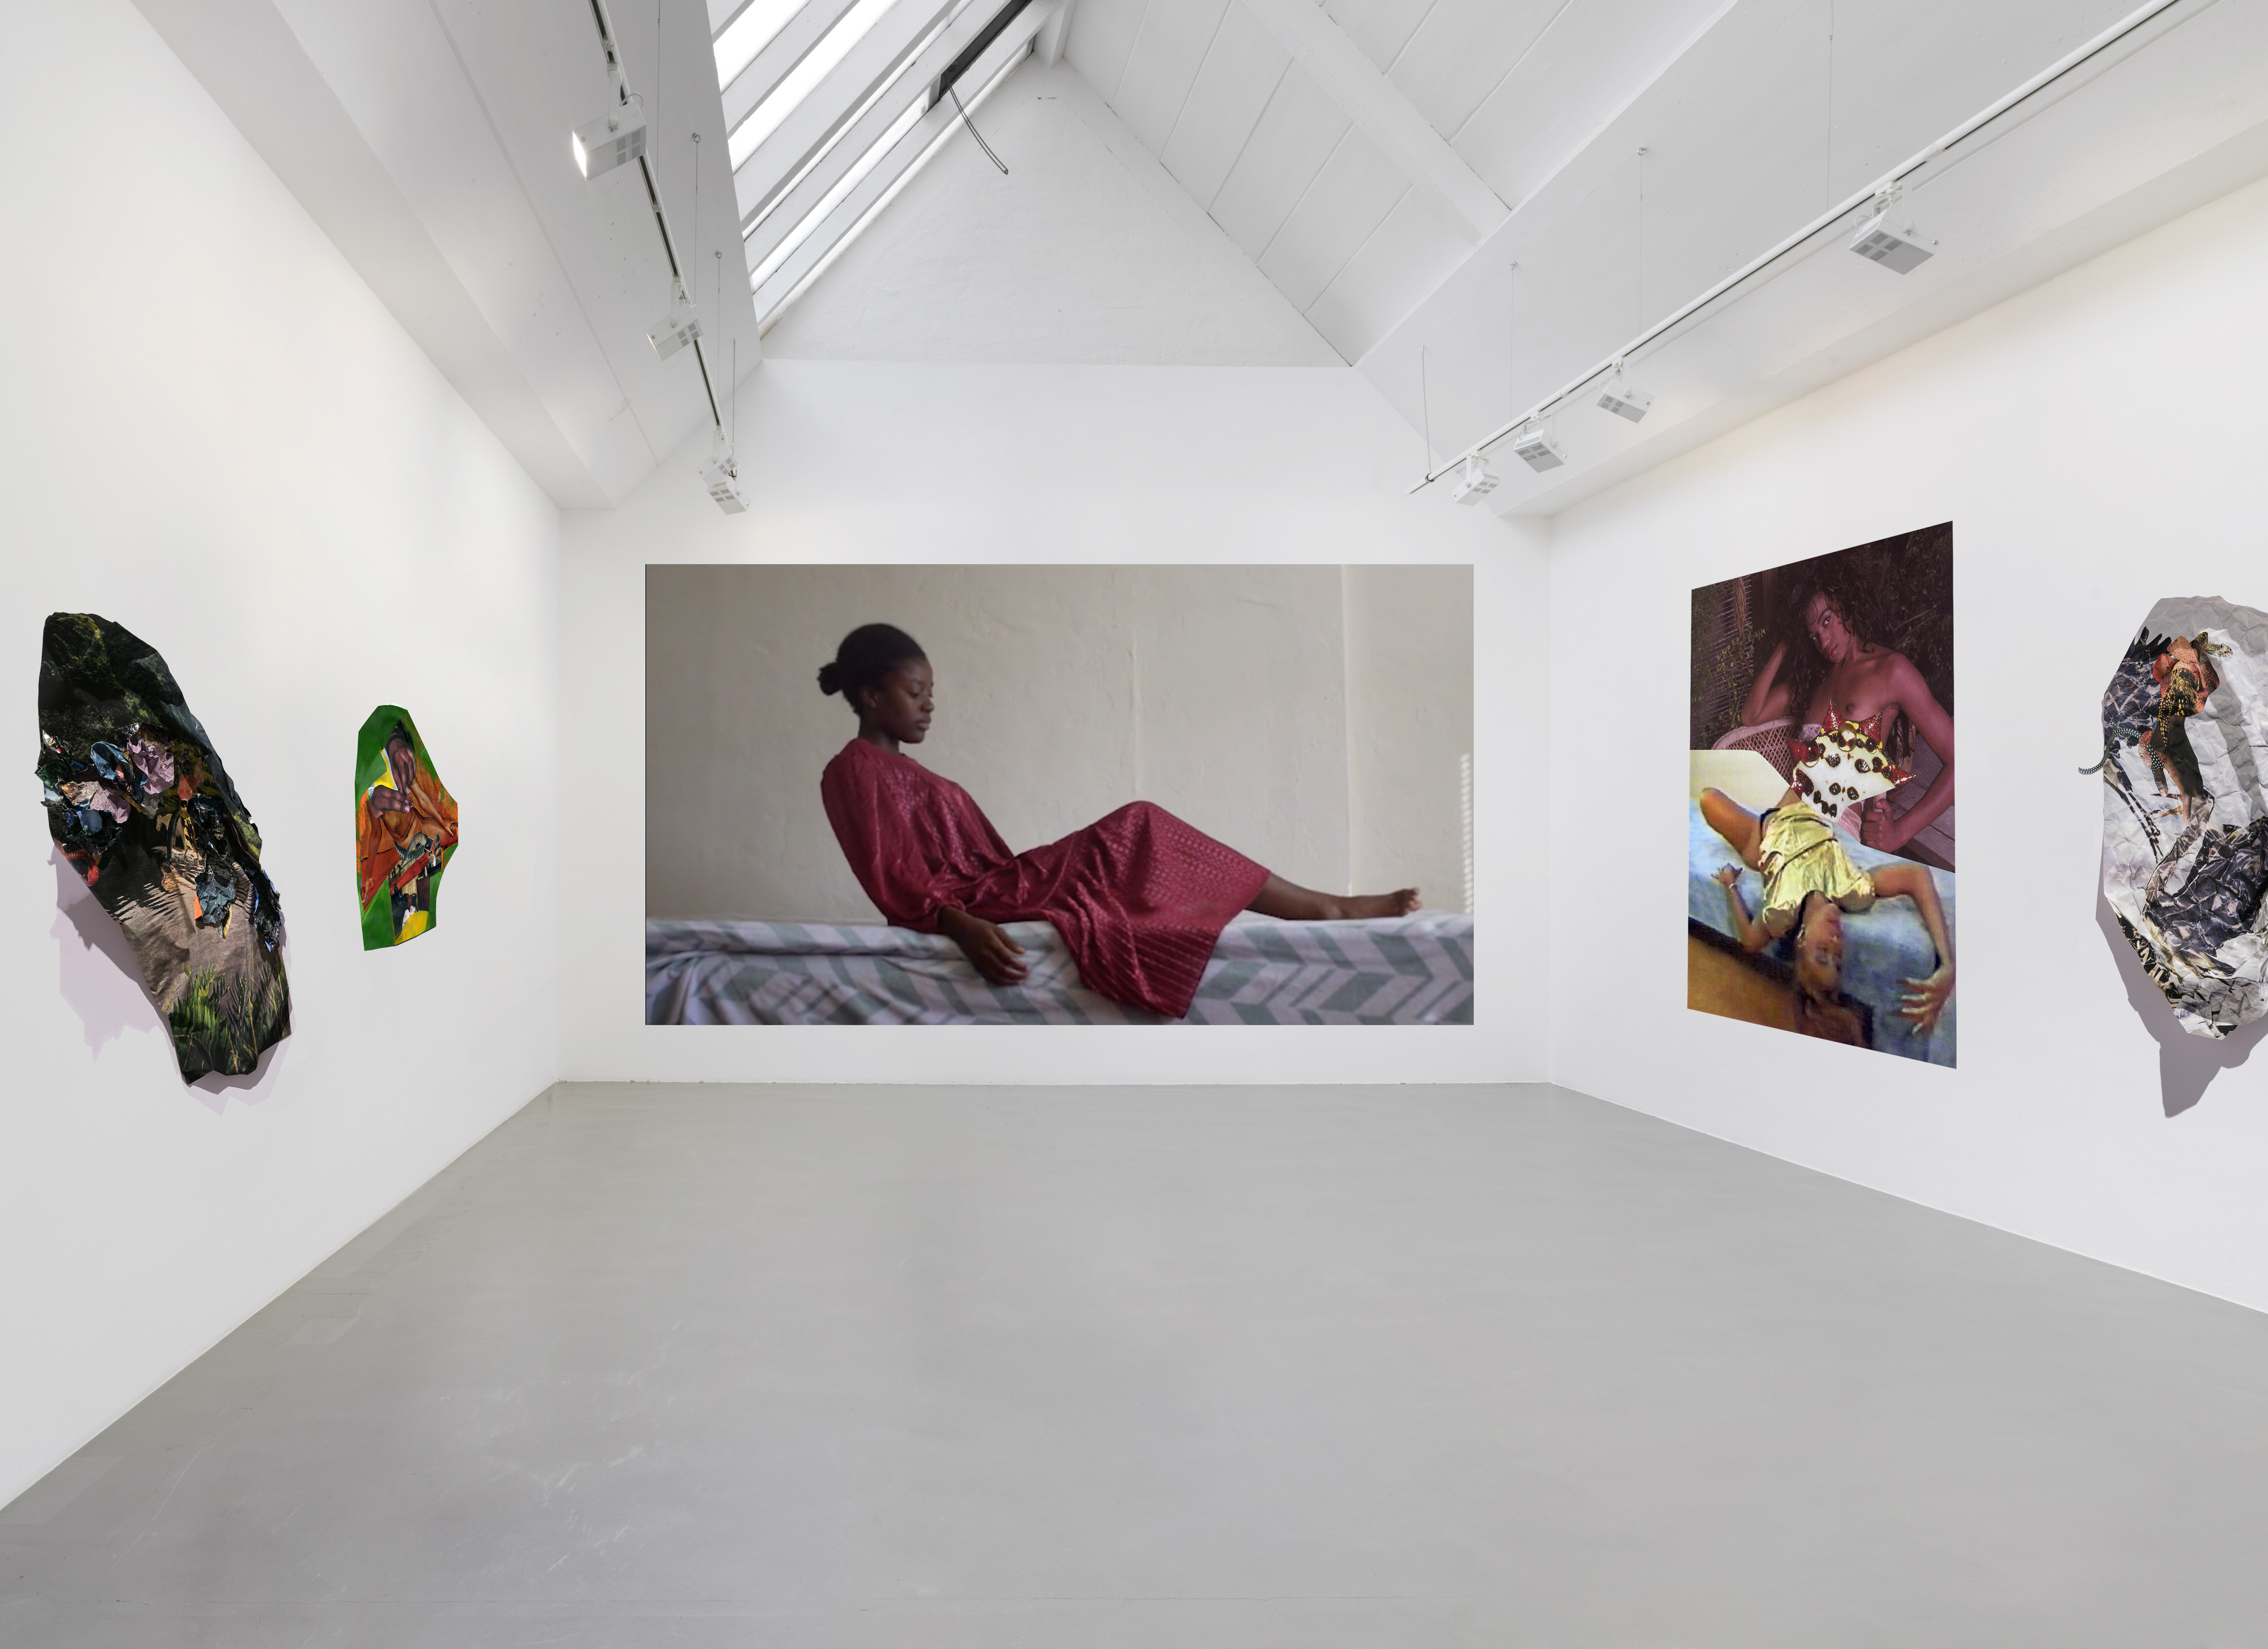 Galerie Barbara Thumm \ New Viewings #18 \ Come Undone: Suné Woods & Ranu Mukherjee